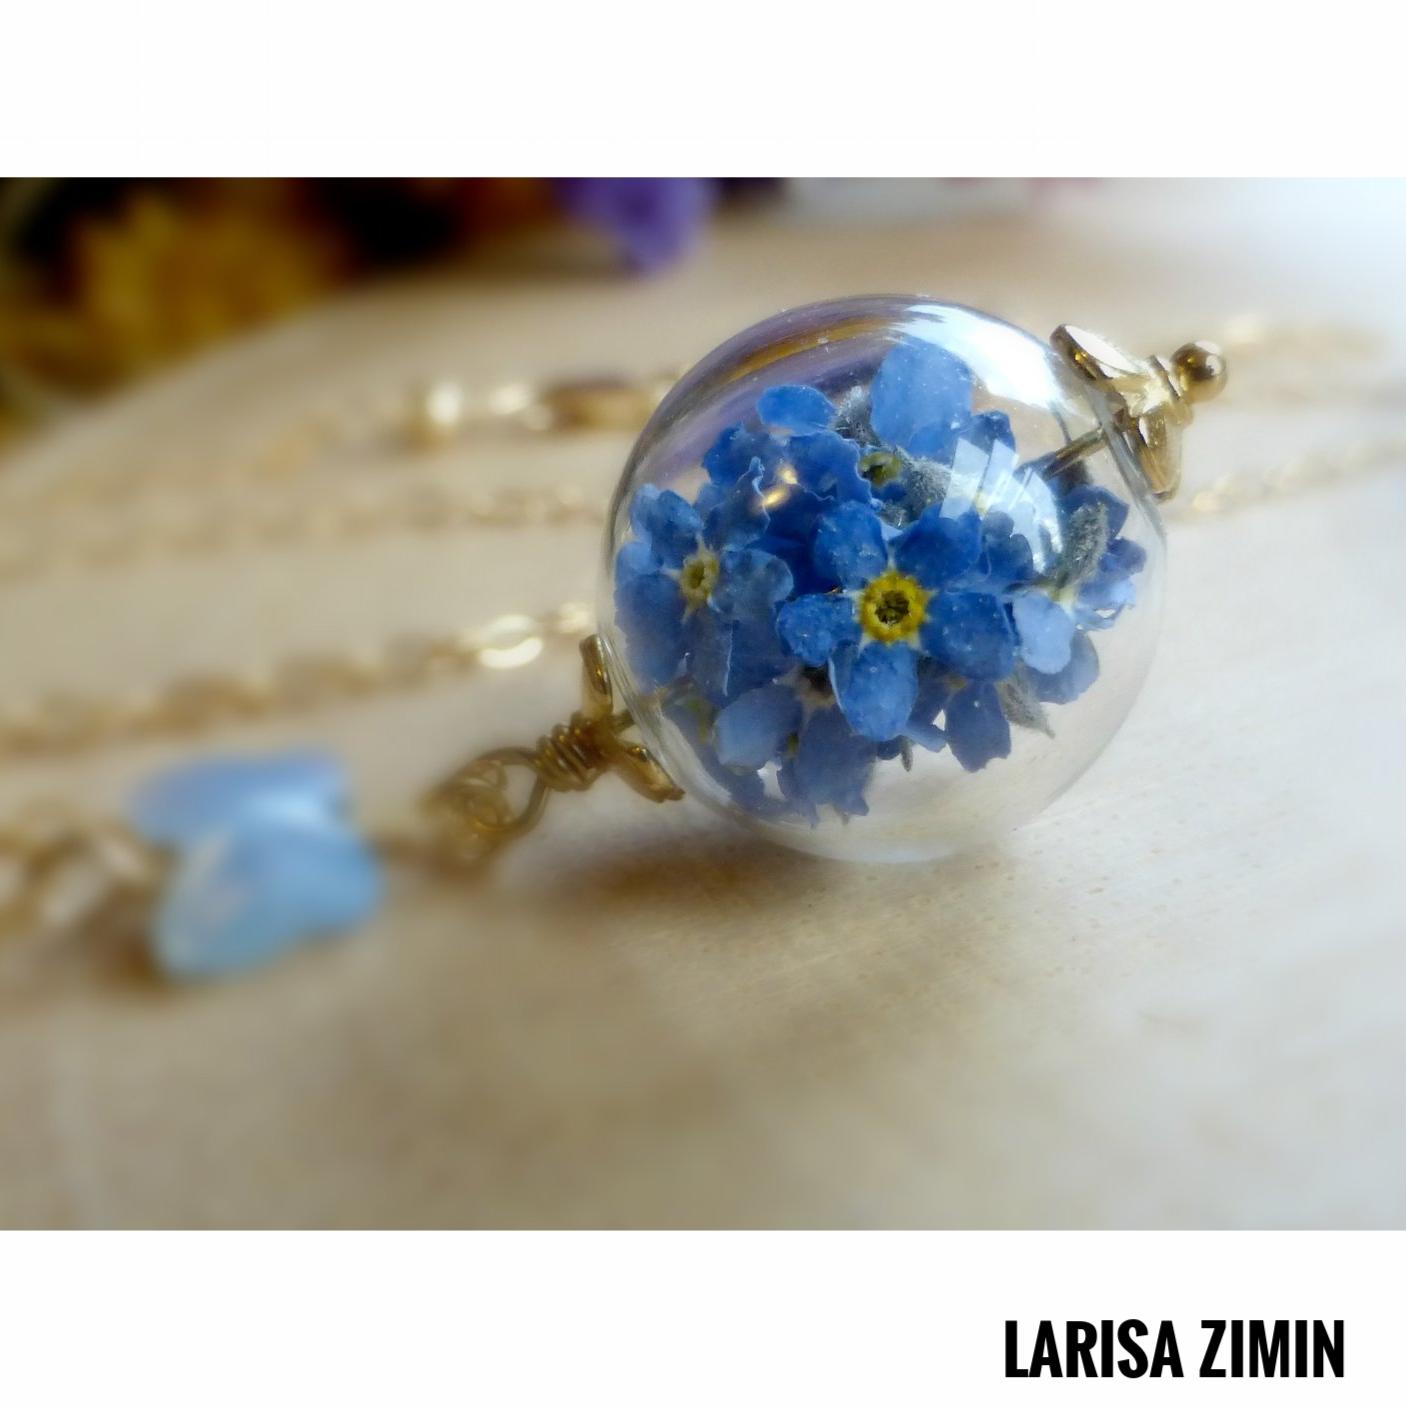 Larisa Zimin